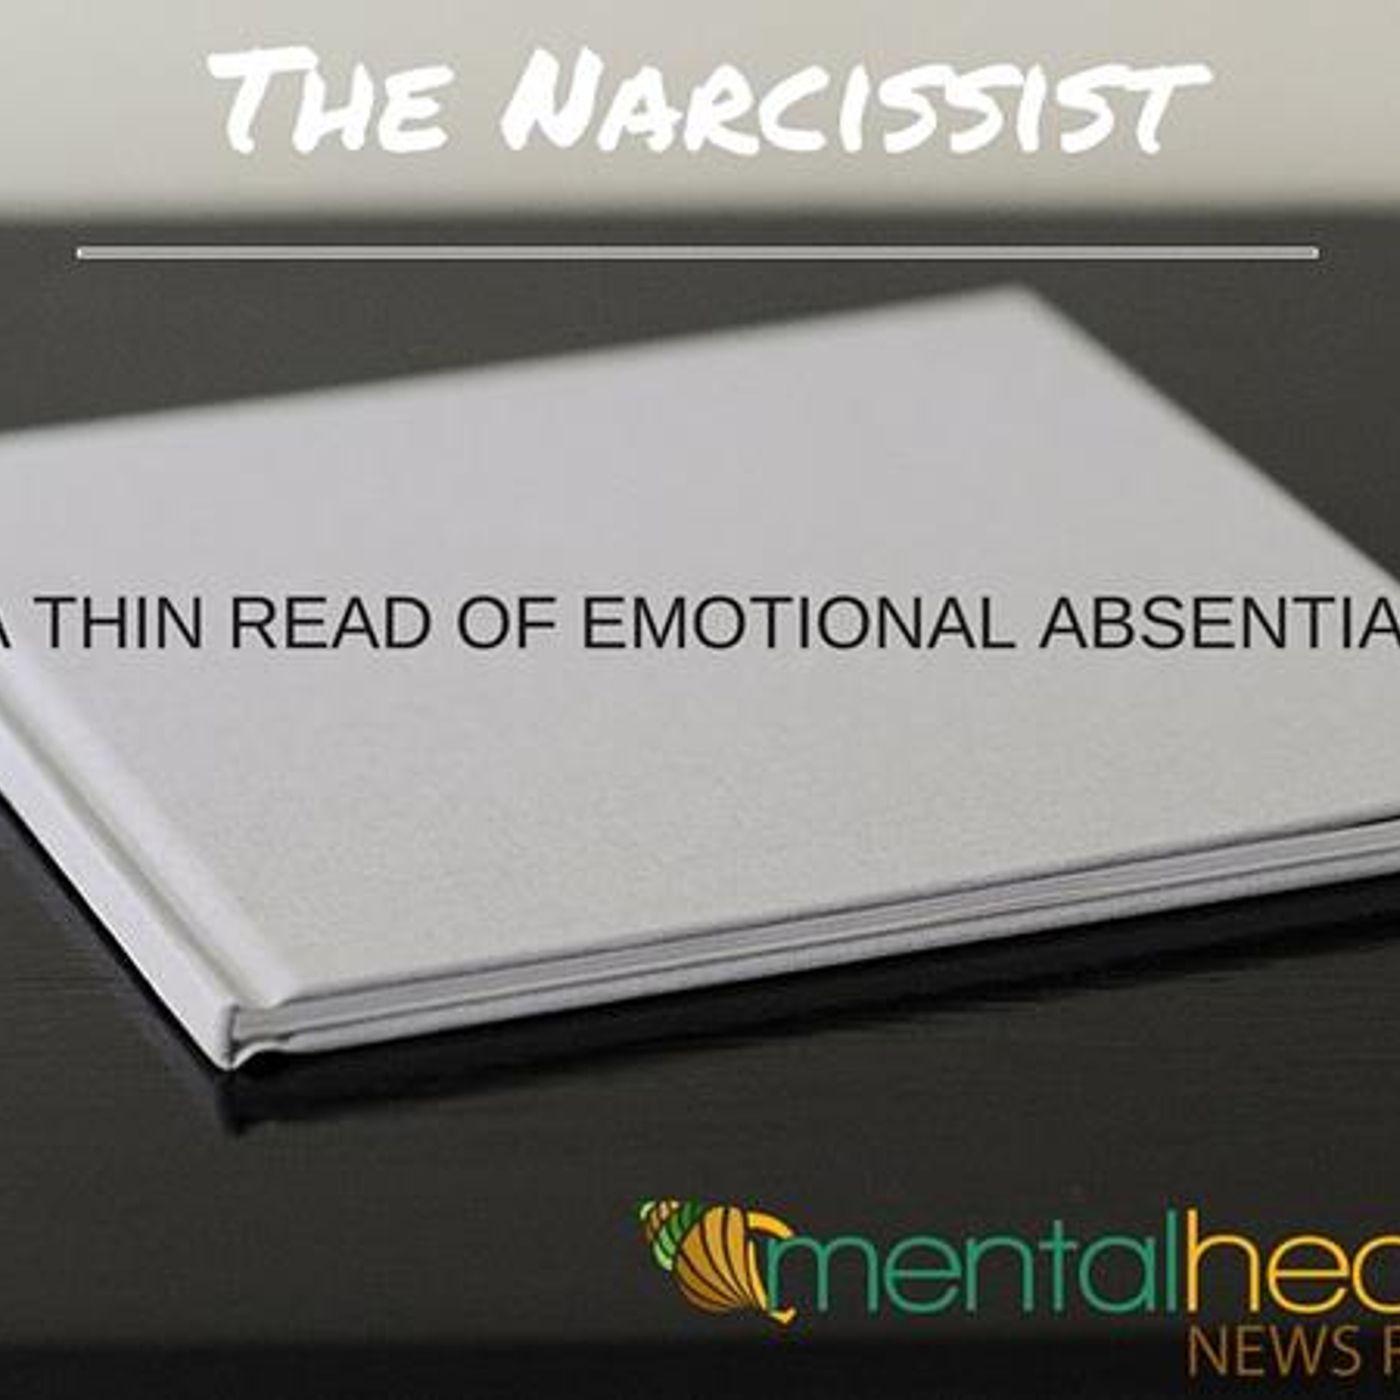 Mental Health News Radio - Is Narcissism Psychological Viagra?